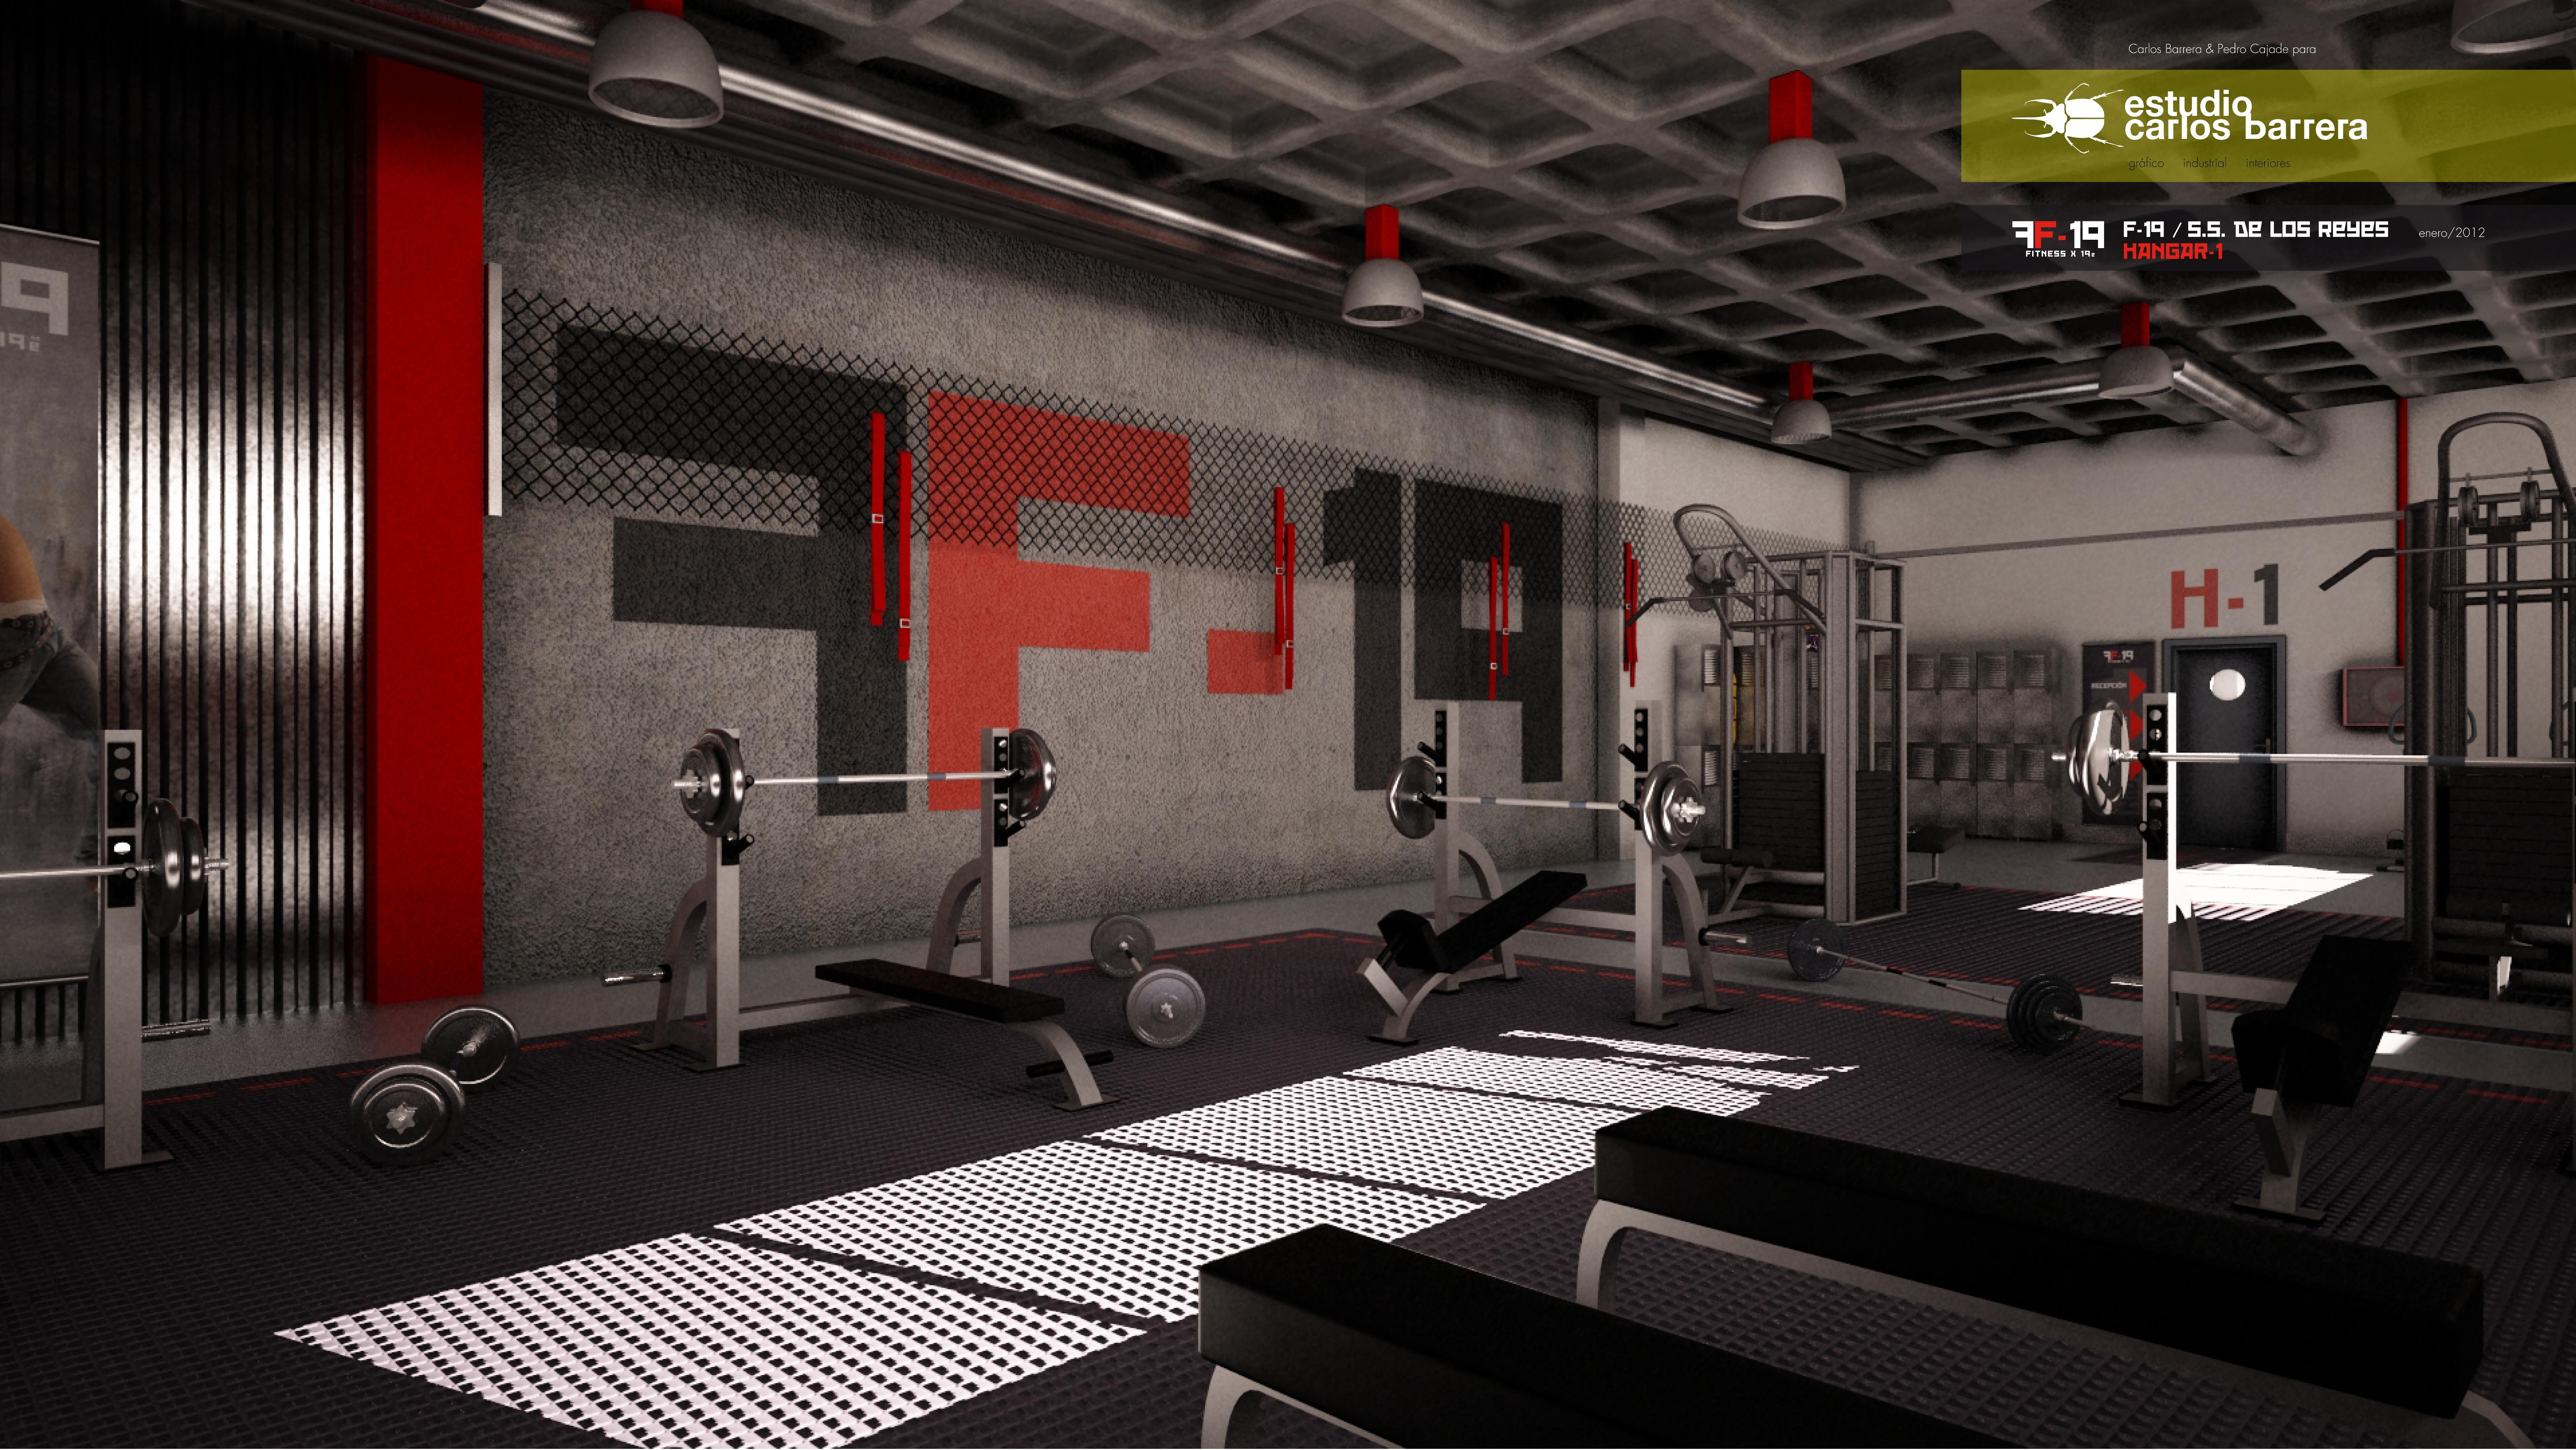 Los gimnasios low cost revolucionan espa a grupo fitness19 for Gimnasio one